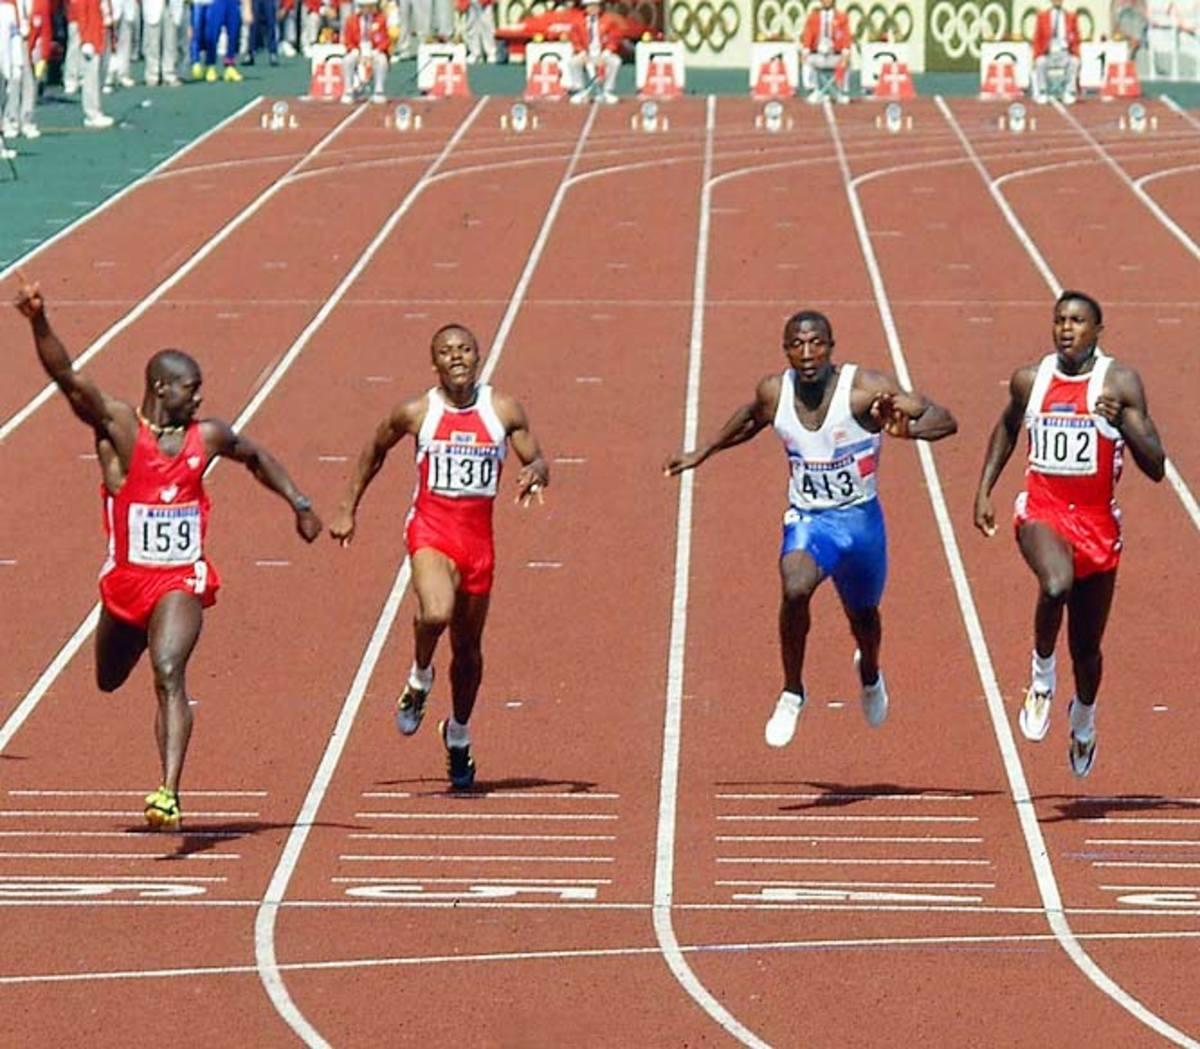 1988 100-meter Olympic final